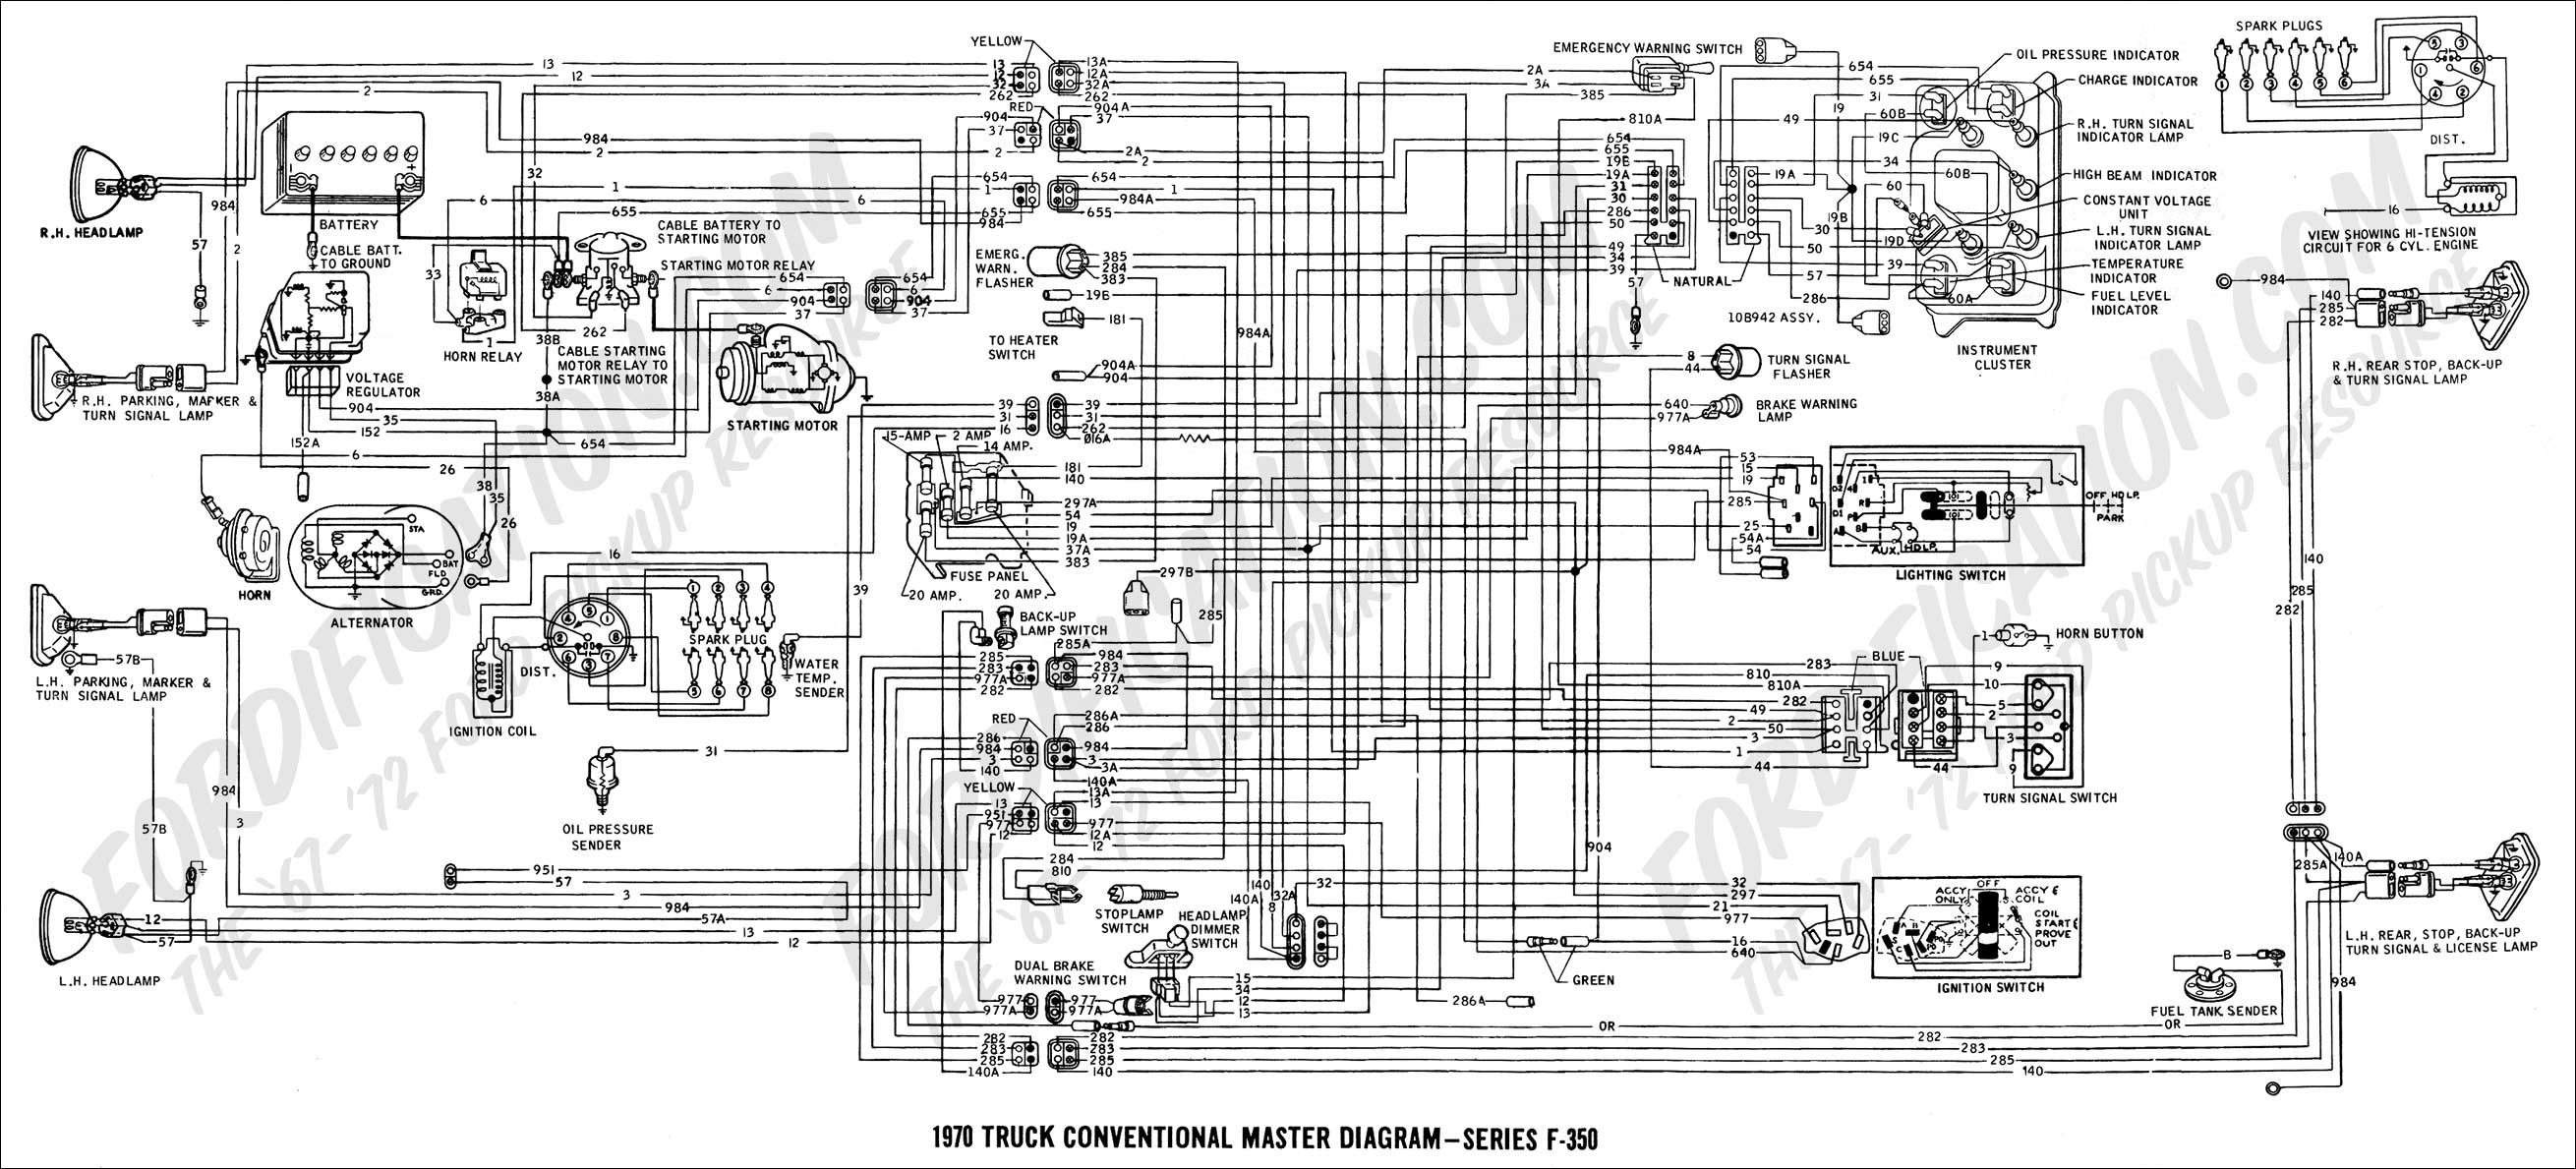 Electric Trailer Brake Wiring Diagrams Ford | Wiring Diagram - Ford F250 Brake Controller Wiring Diagram